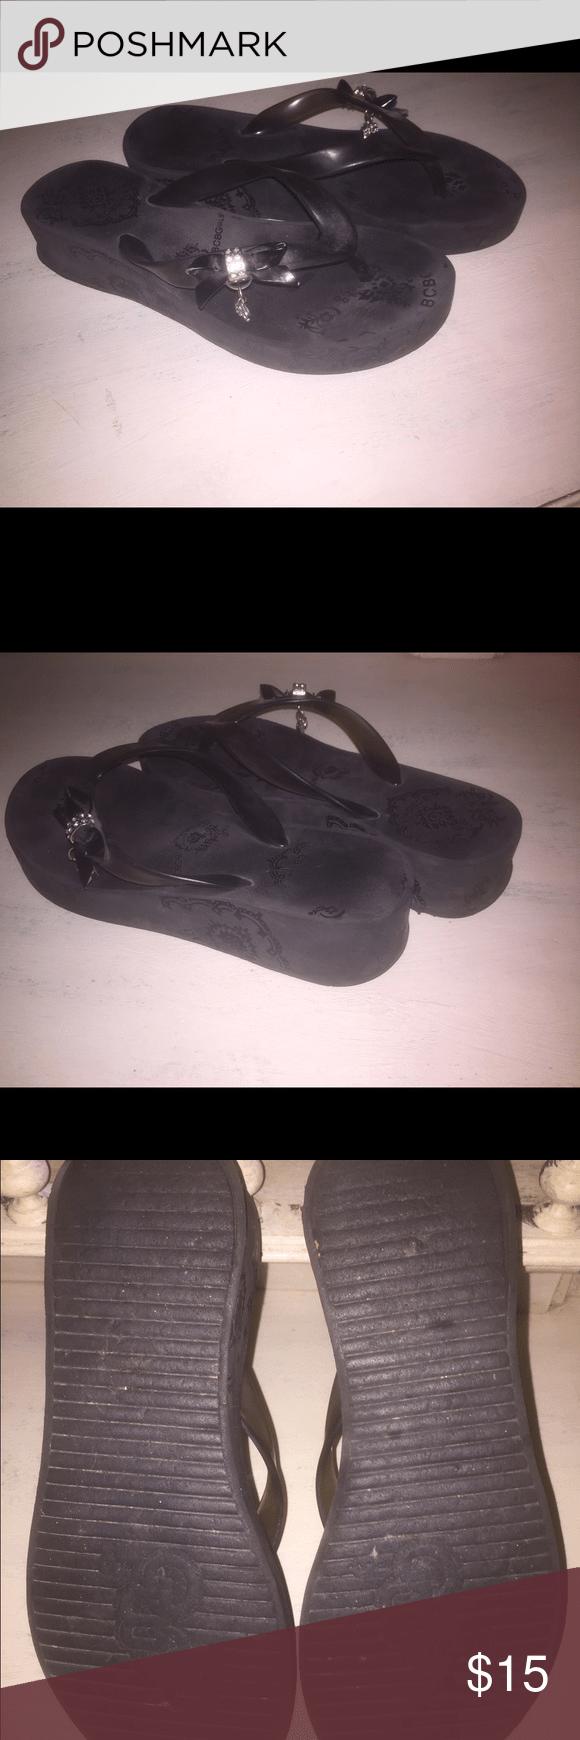 Black women s bcbgirl sandals size 7 these comfortable black sandals are size 7 bcbgirls shoes sandals